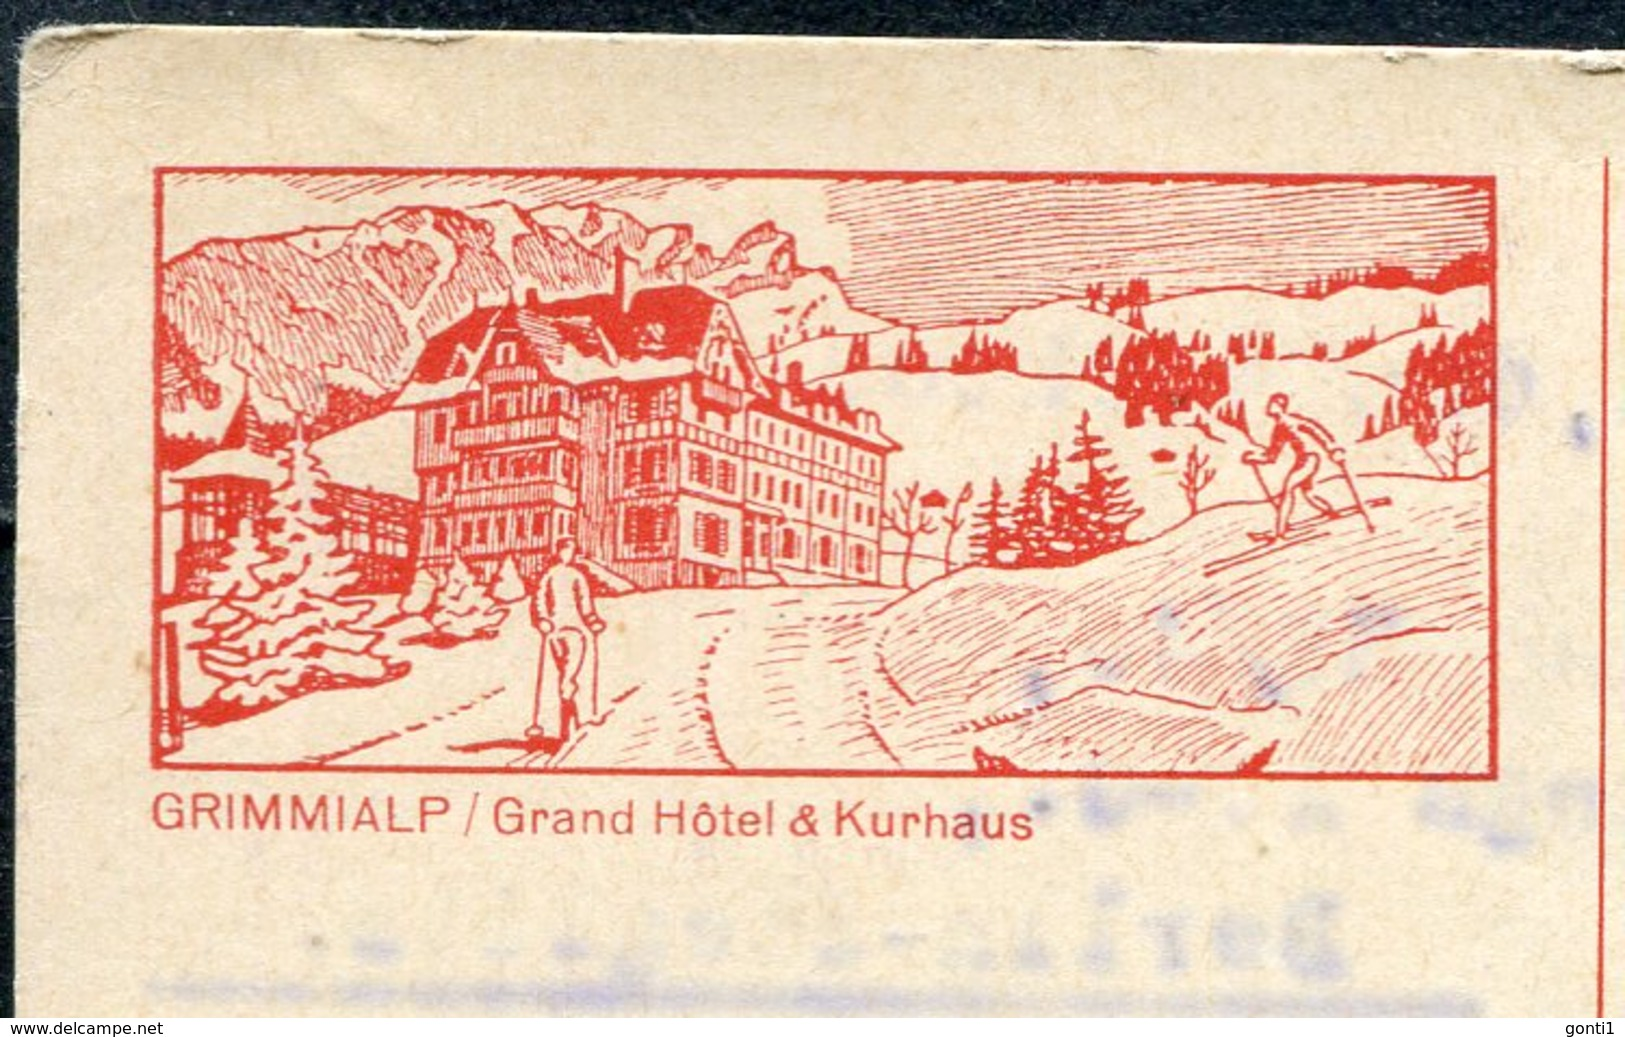 "Schweiz 1927 Bildpostkarte Mi.Nr.P????-20er,rot"" Grimmialp,Kurhaus"" Befördert ""Zürich-Berlin,Germany  ""1 GS Used - Postwaardestukken"